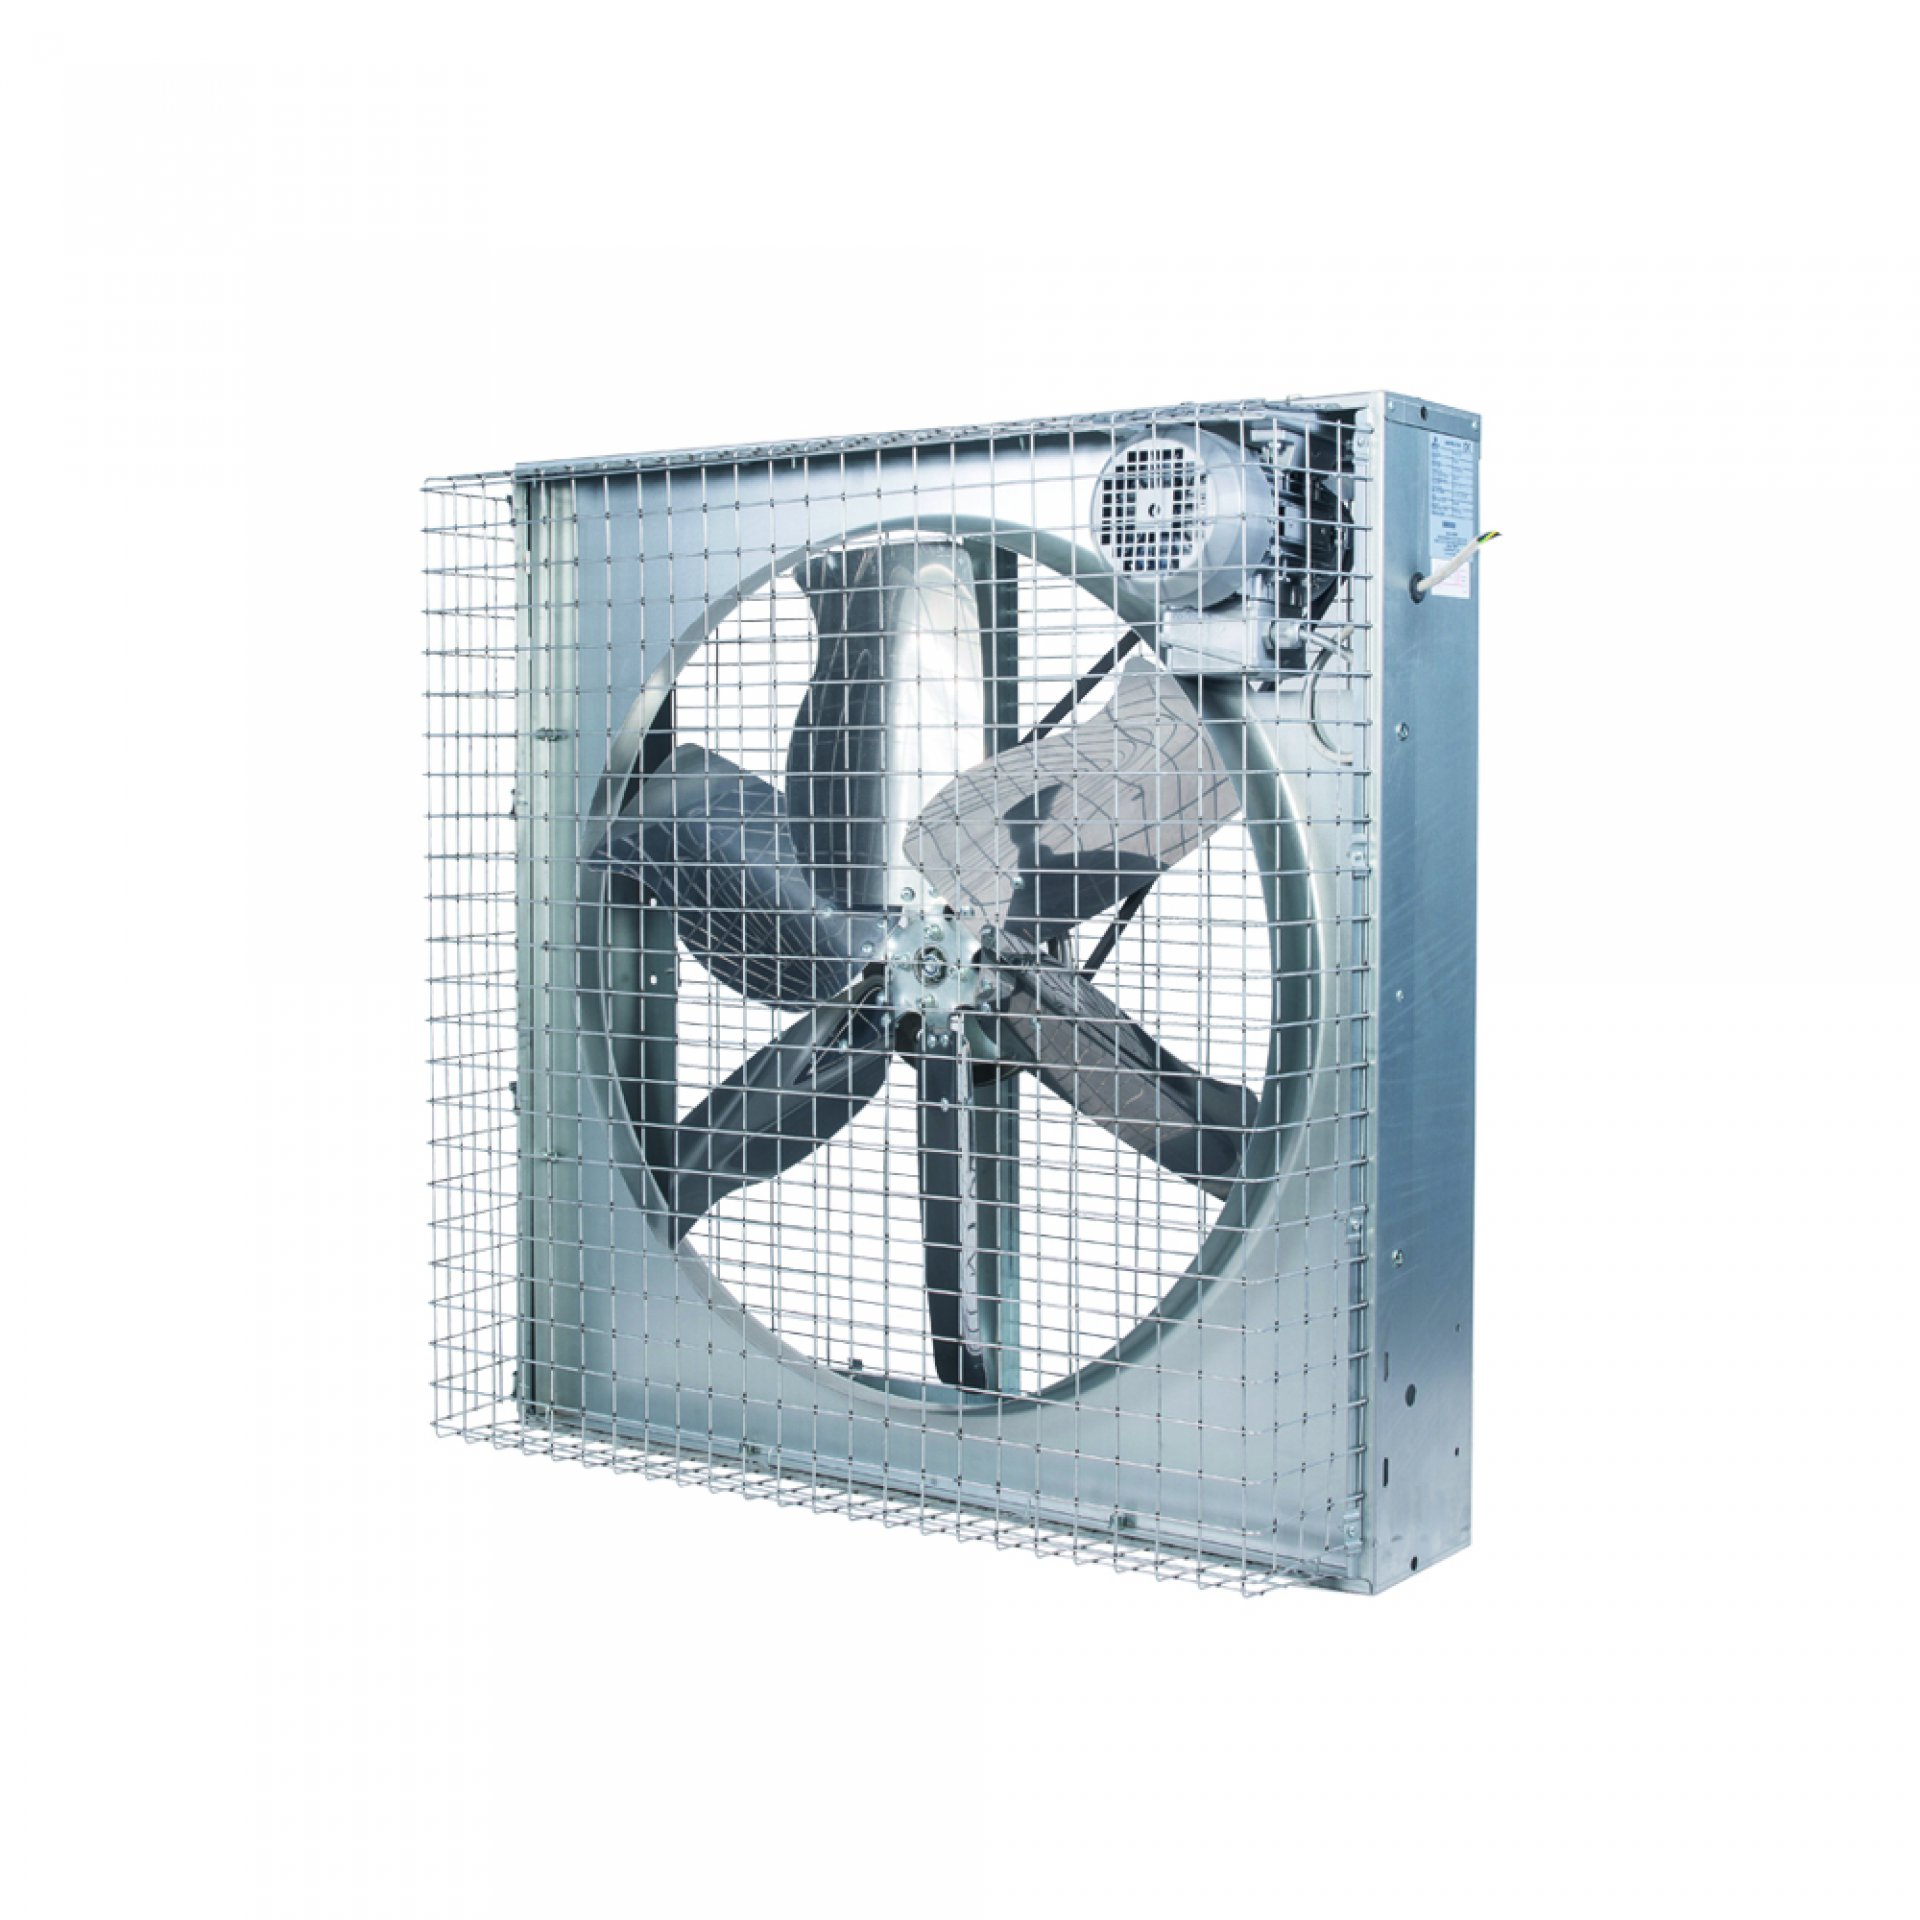 760-narrow-case-sequential-wire-ventilation-fan